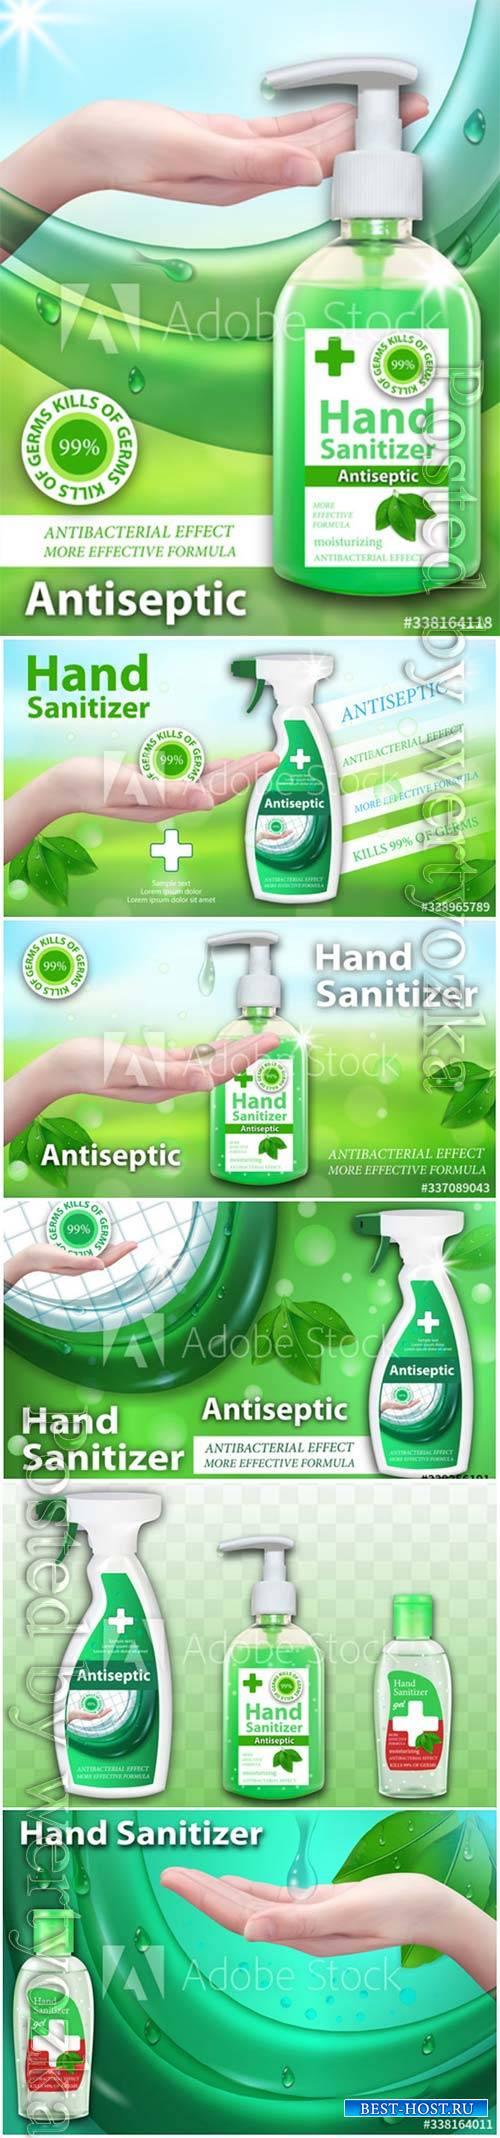 Antiseptic for hands in bottles vector design